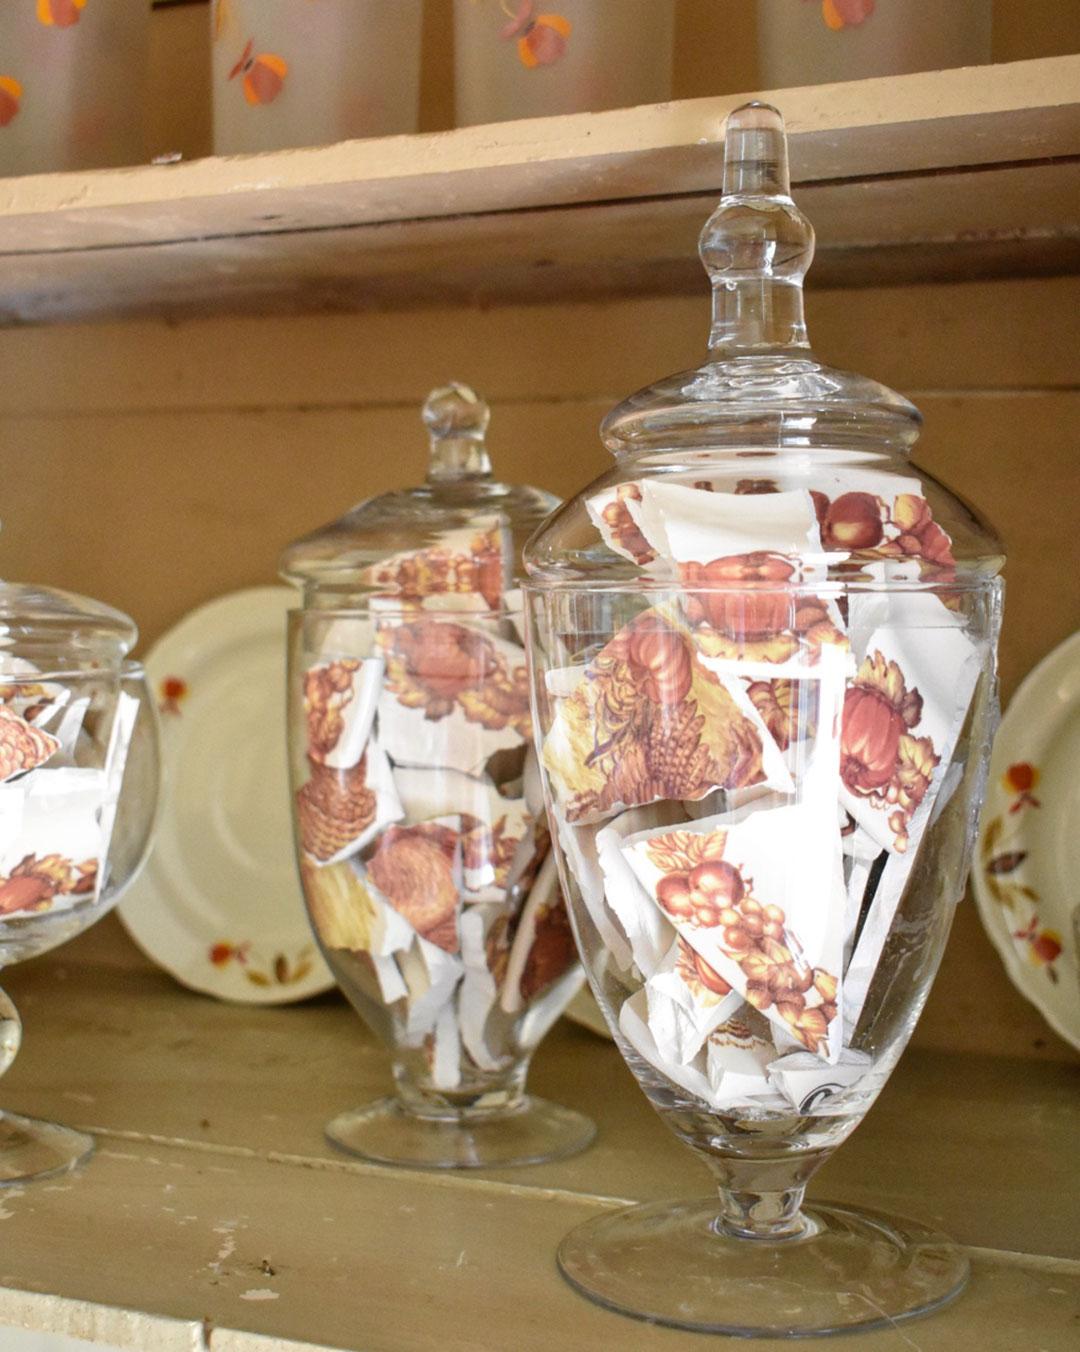 Apothecary jars full of broken plate shards